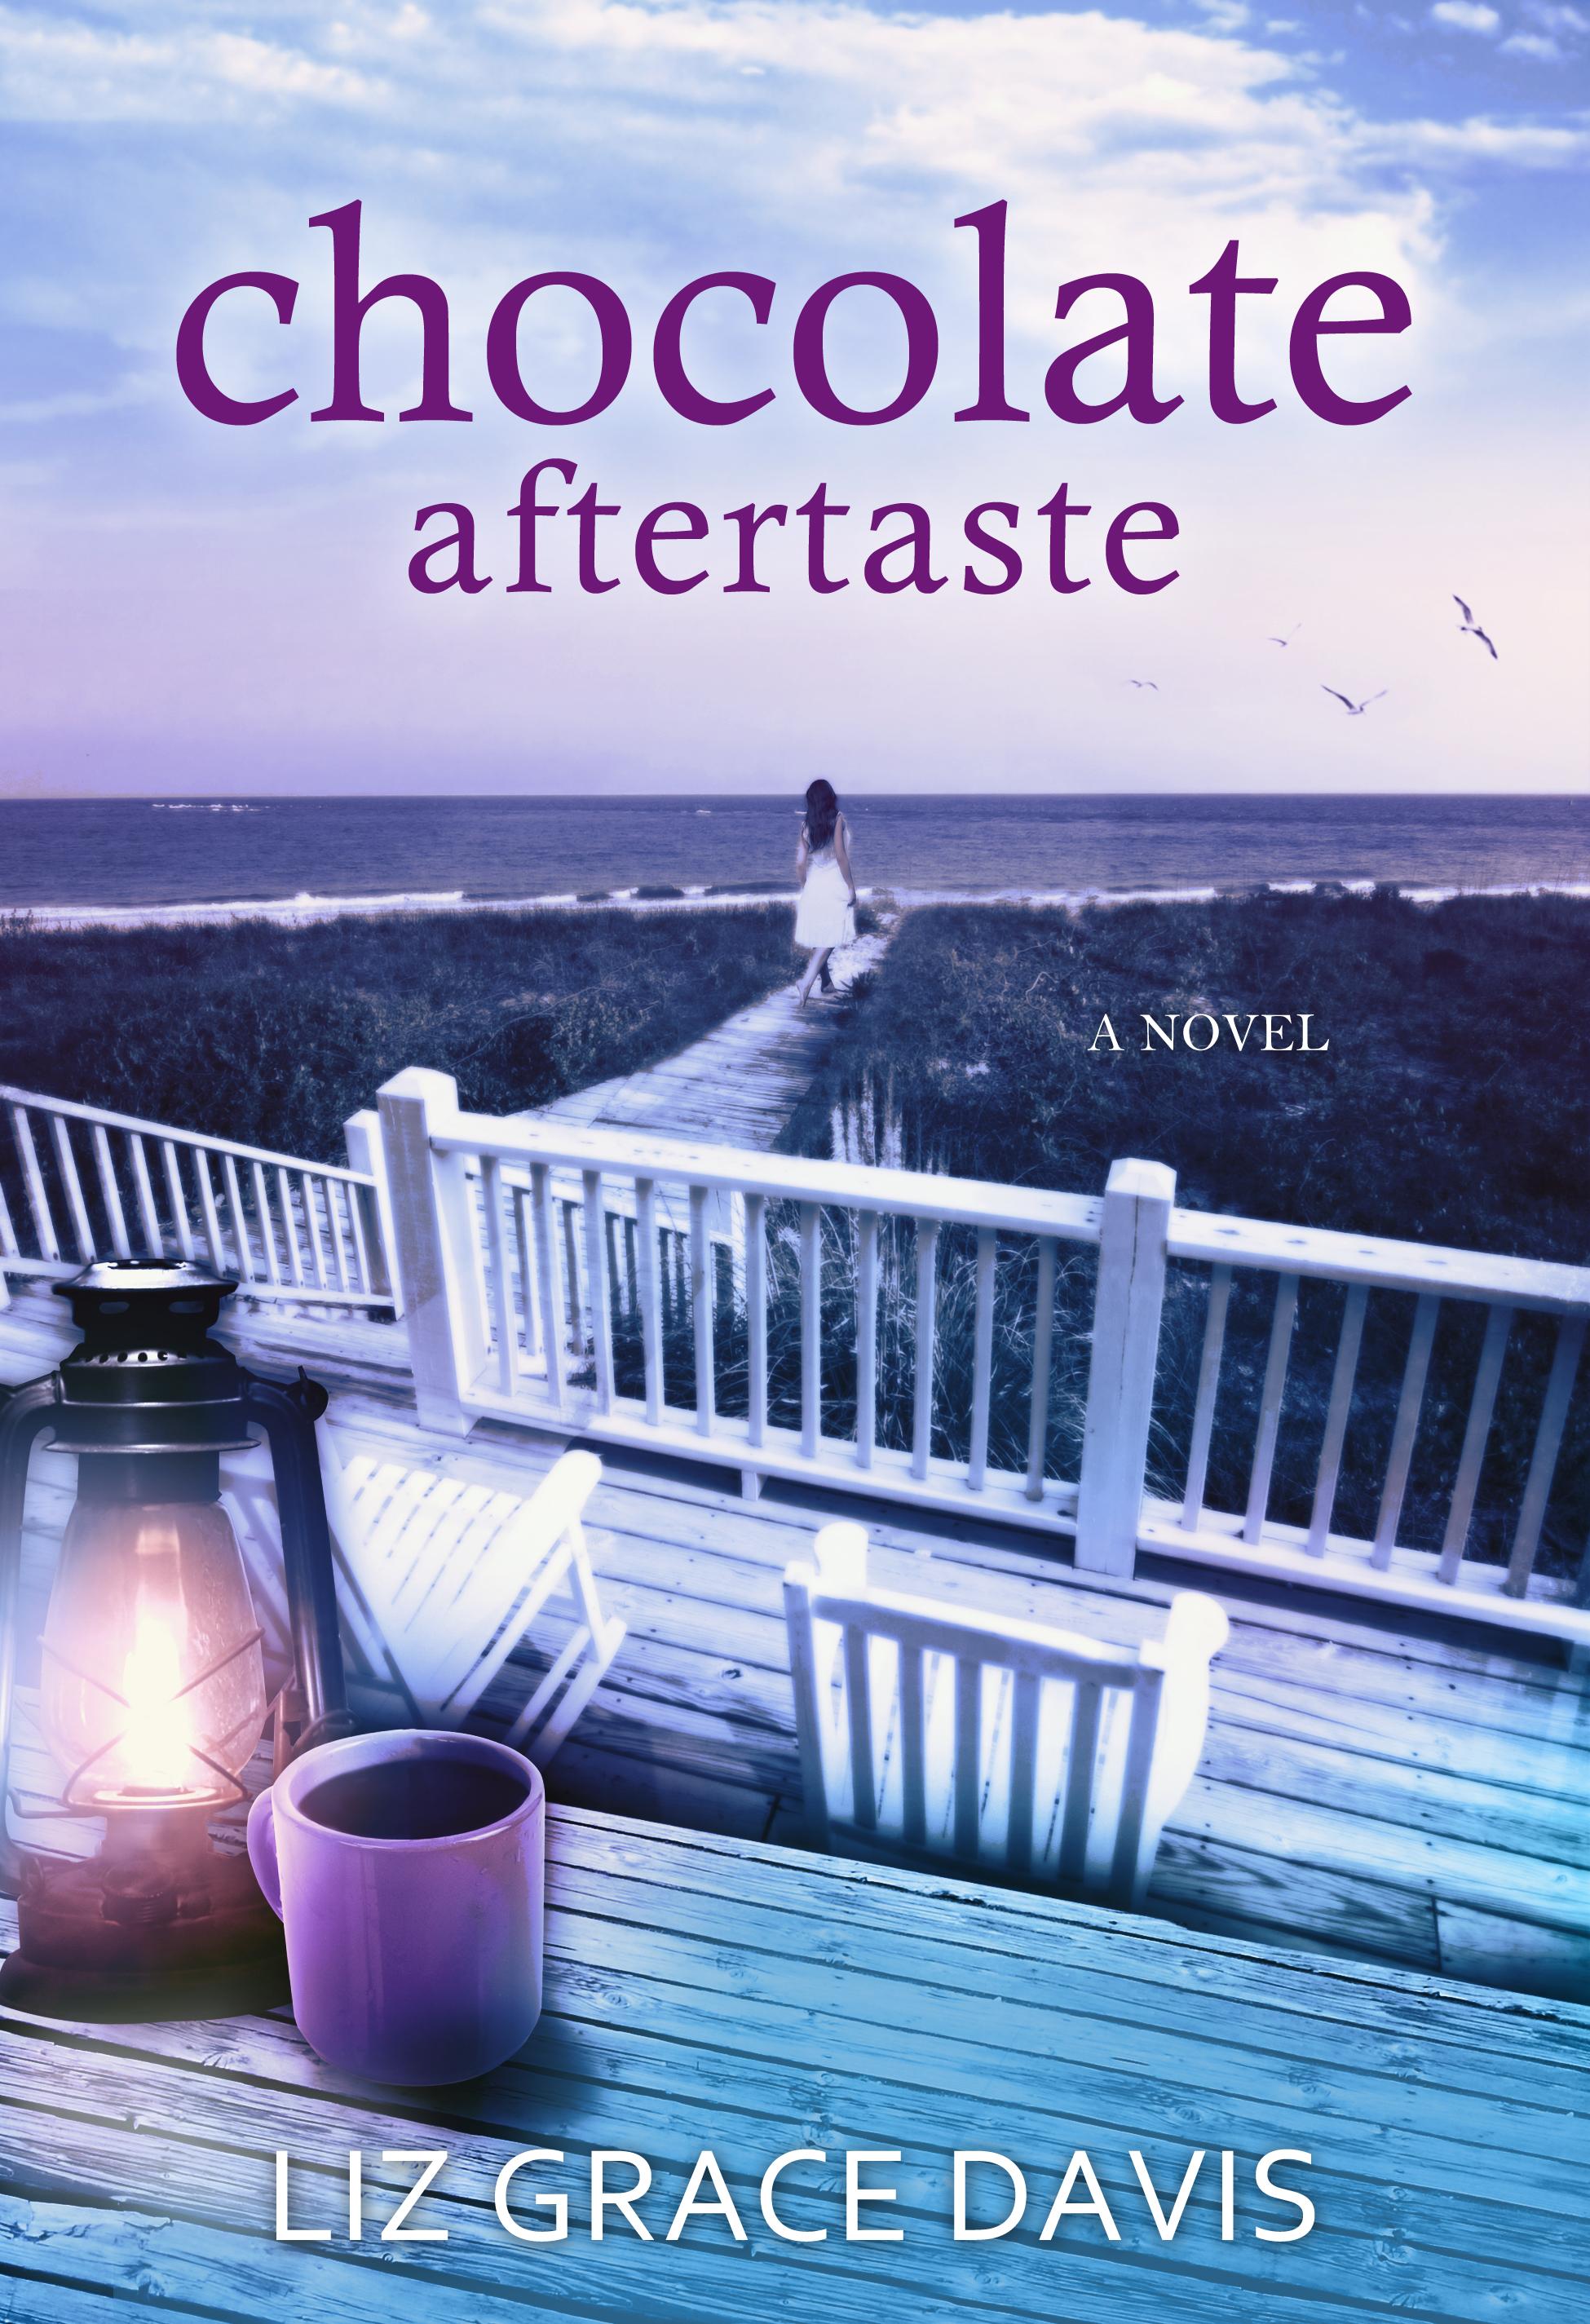 ChocolateAftertaste-LizGraceDavis-Cover